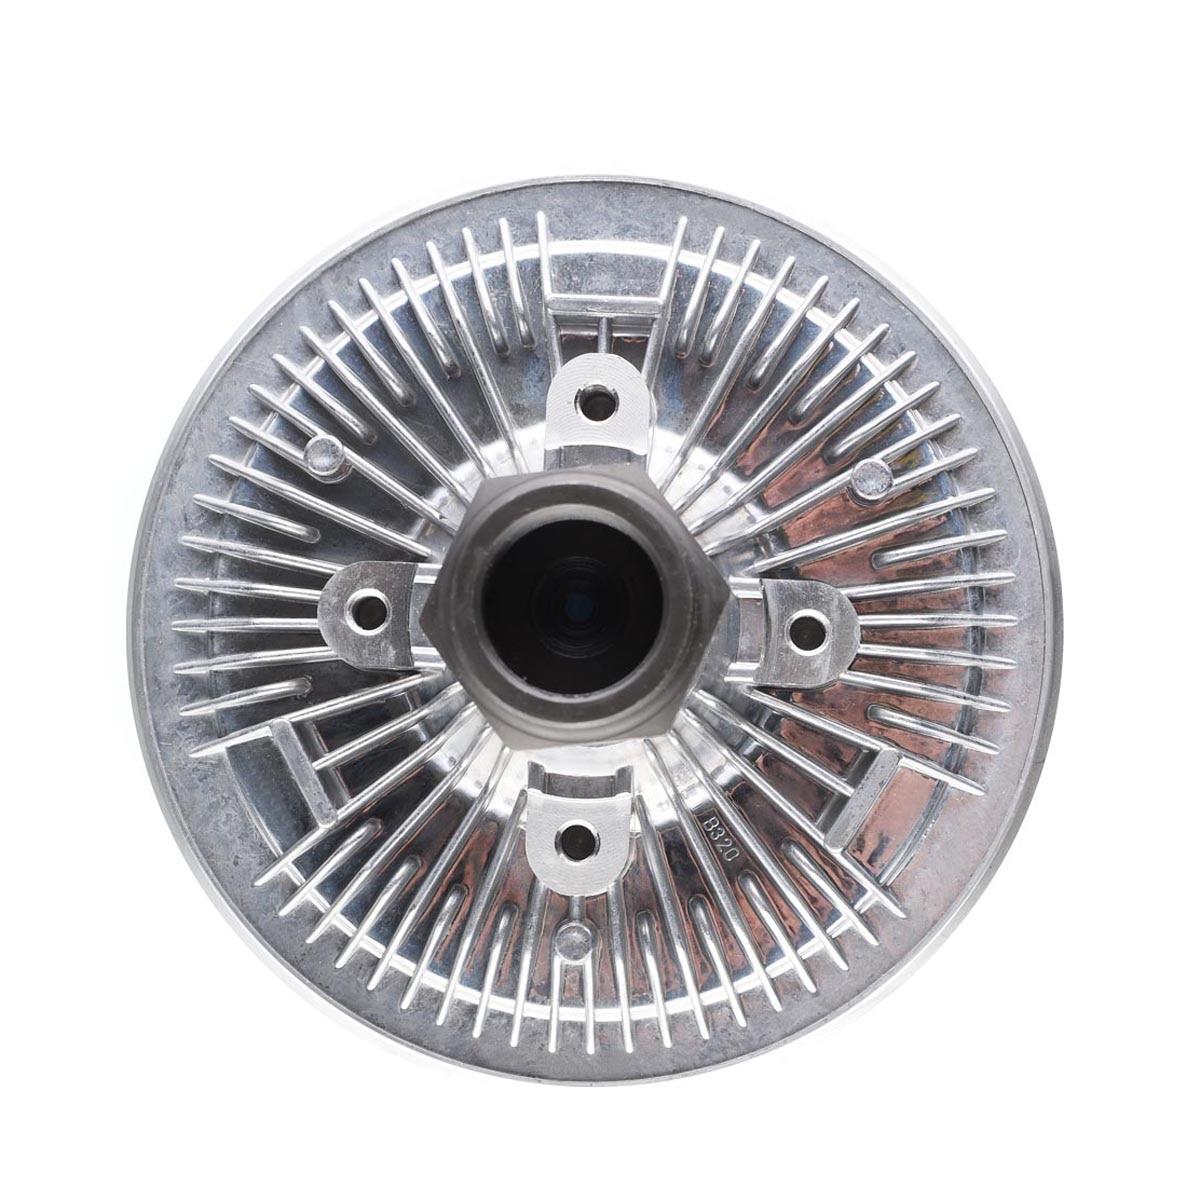 medium resolution of cooling fan clutch for ford excursion f 250 f350 f750 super duty 7 3l turbo diesel 1999 2003 2837 22611 f81z8a616 da f81z8a616da in fans kits from